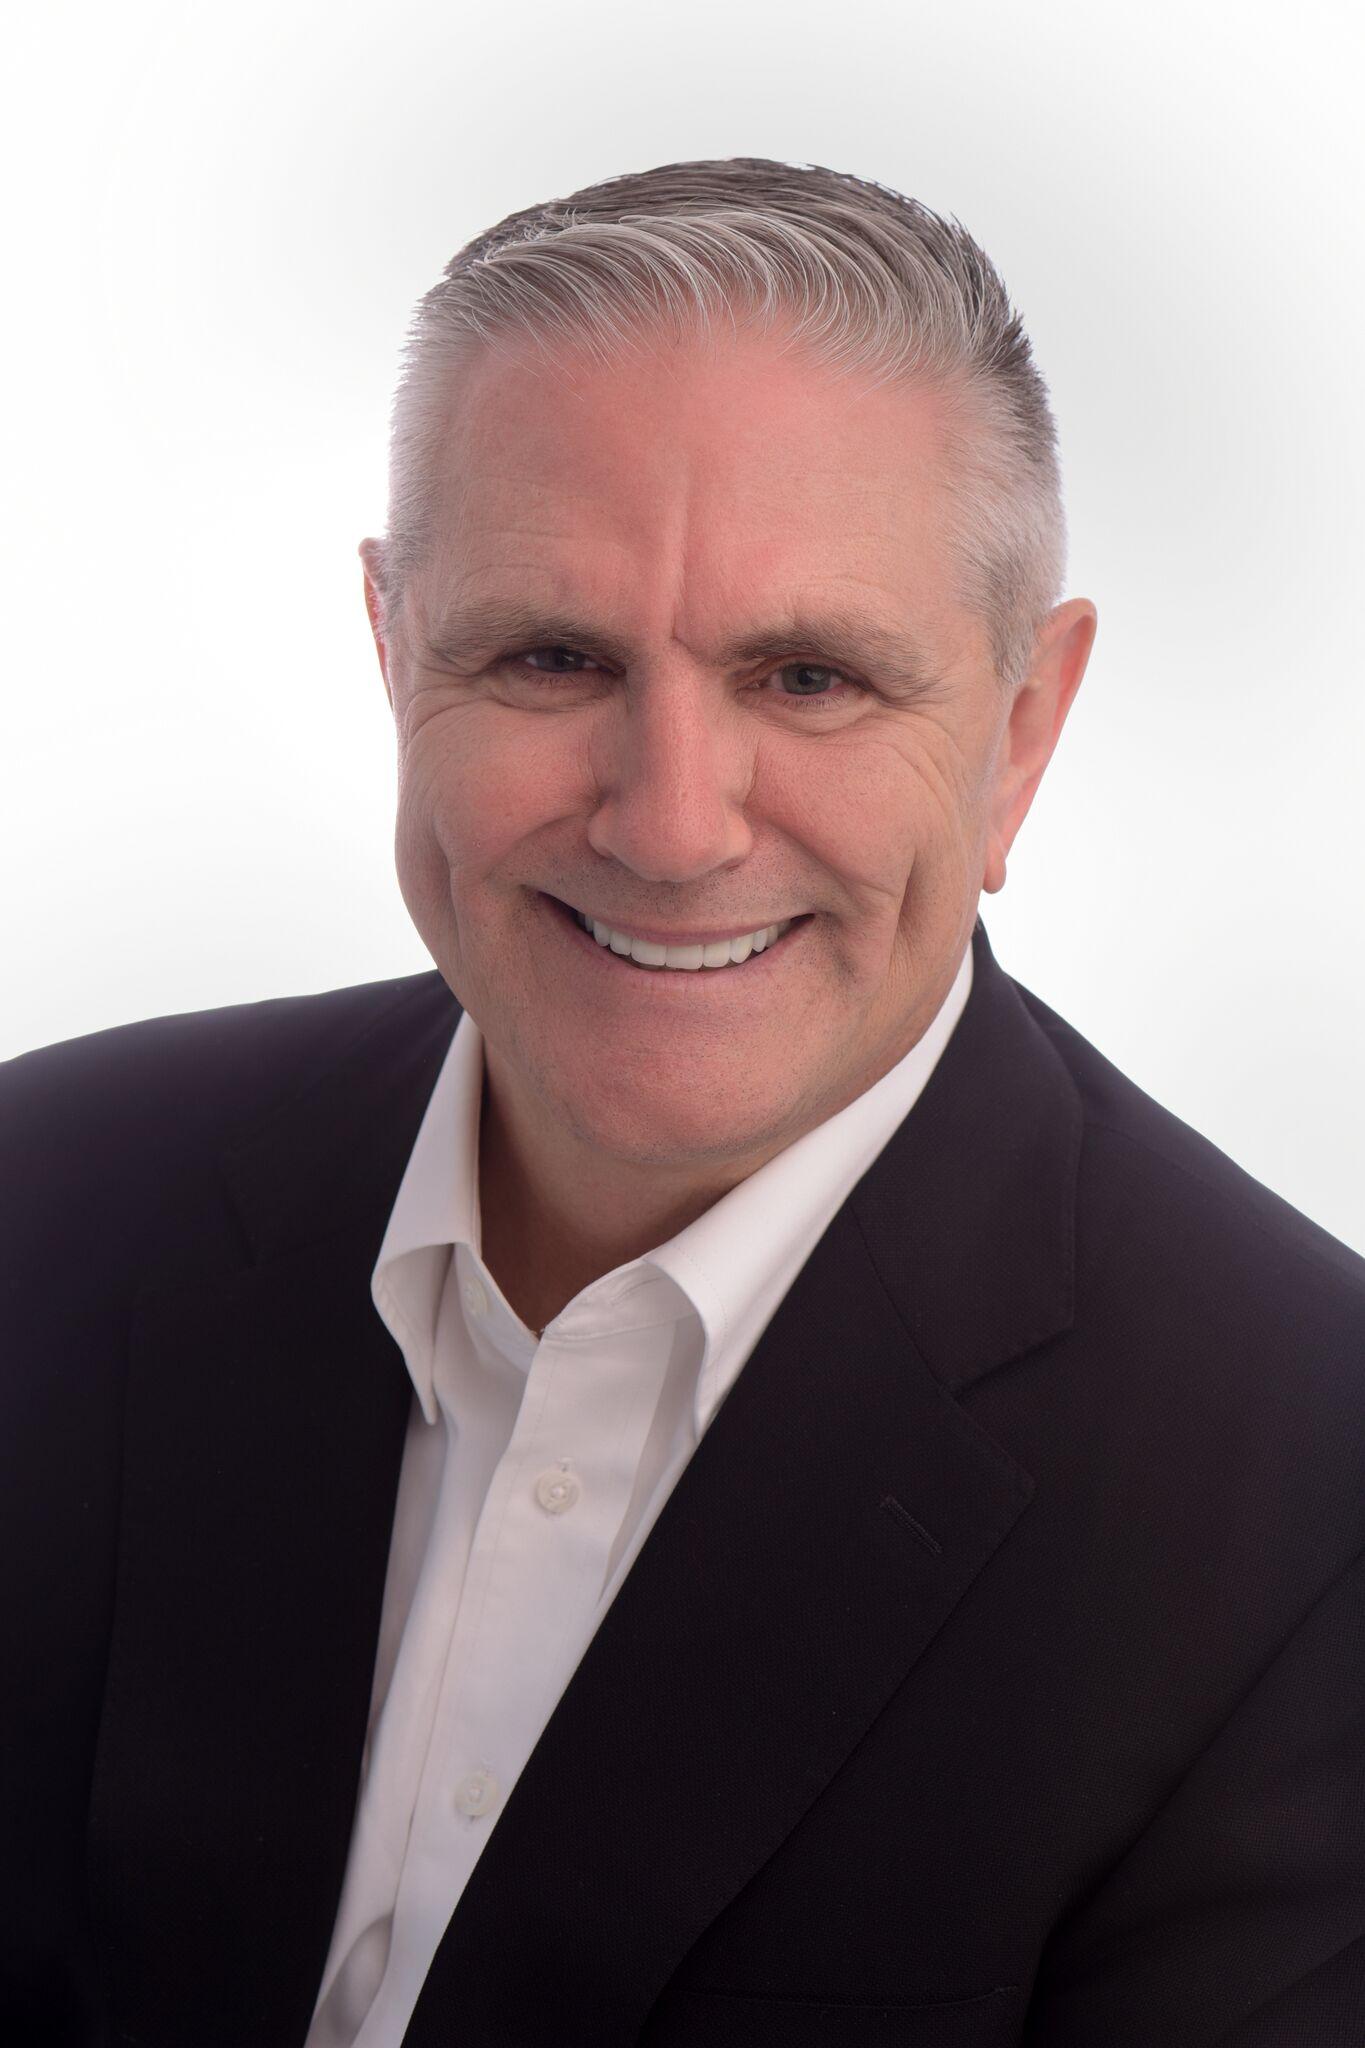 Dr. Tom Klapp